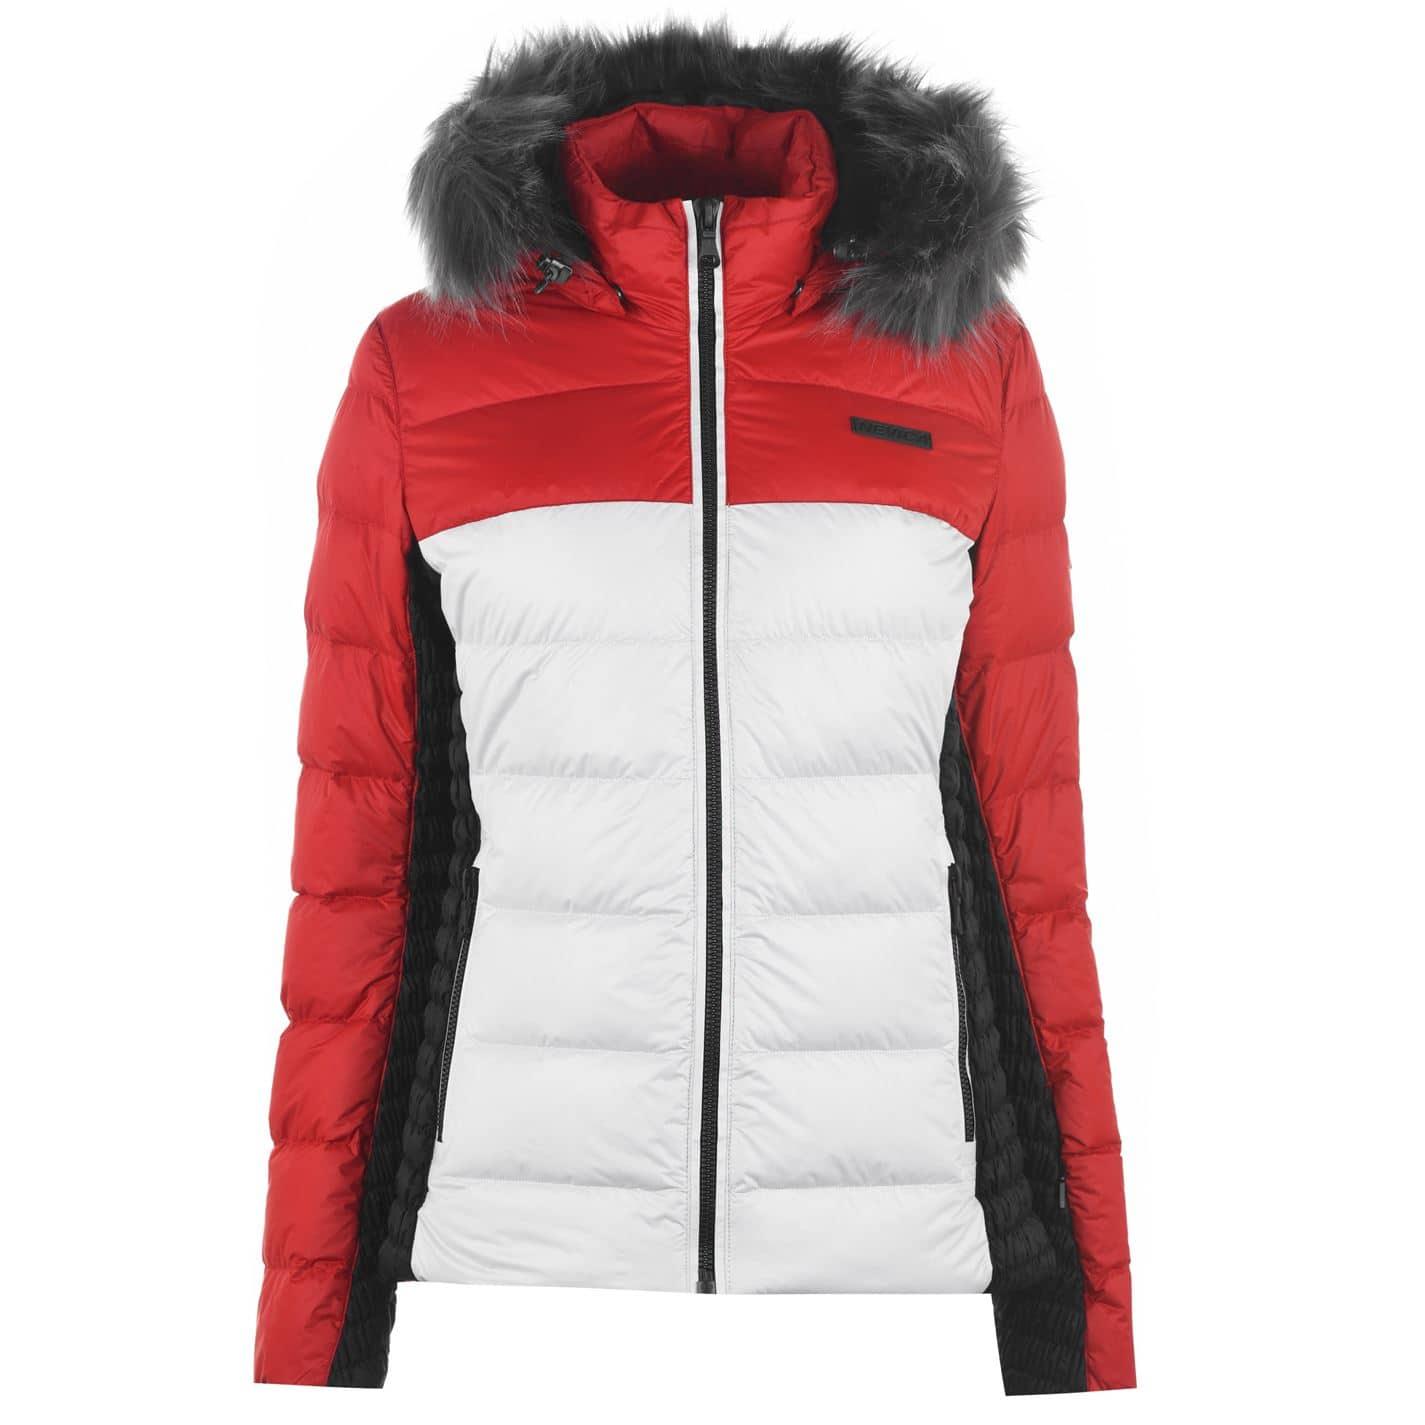 Geaca Ski Nevica Stacey pentru Femei alb rosu